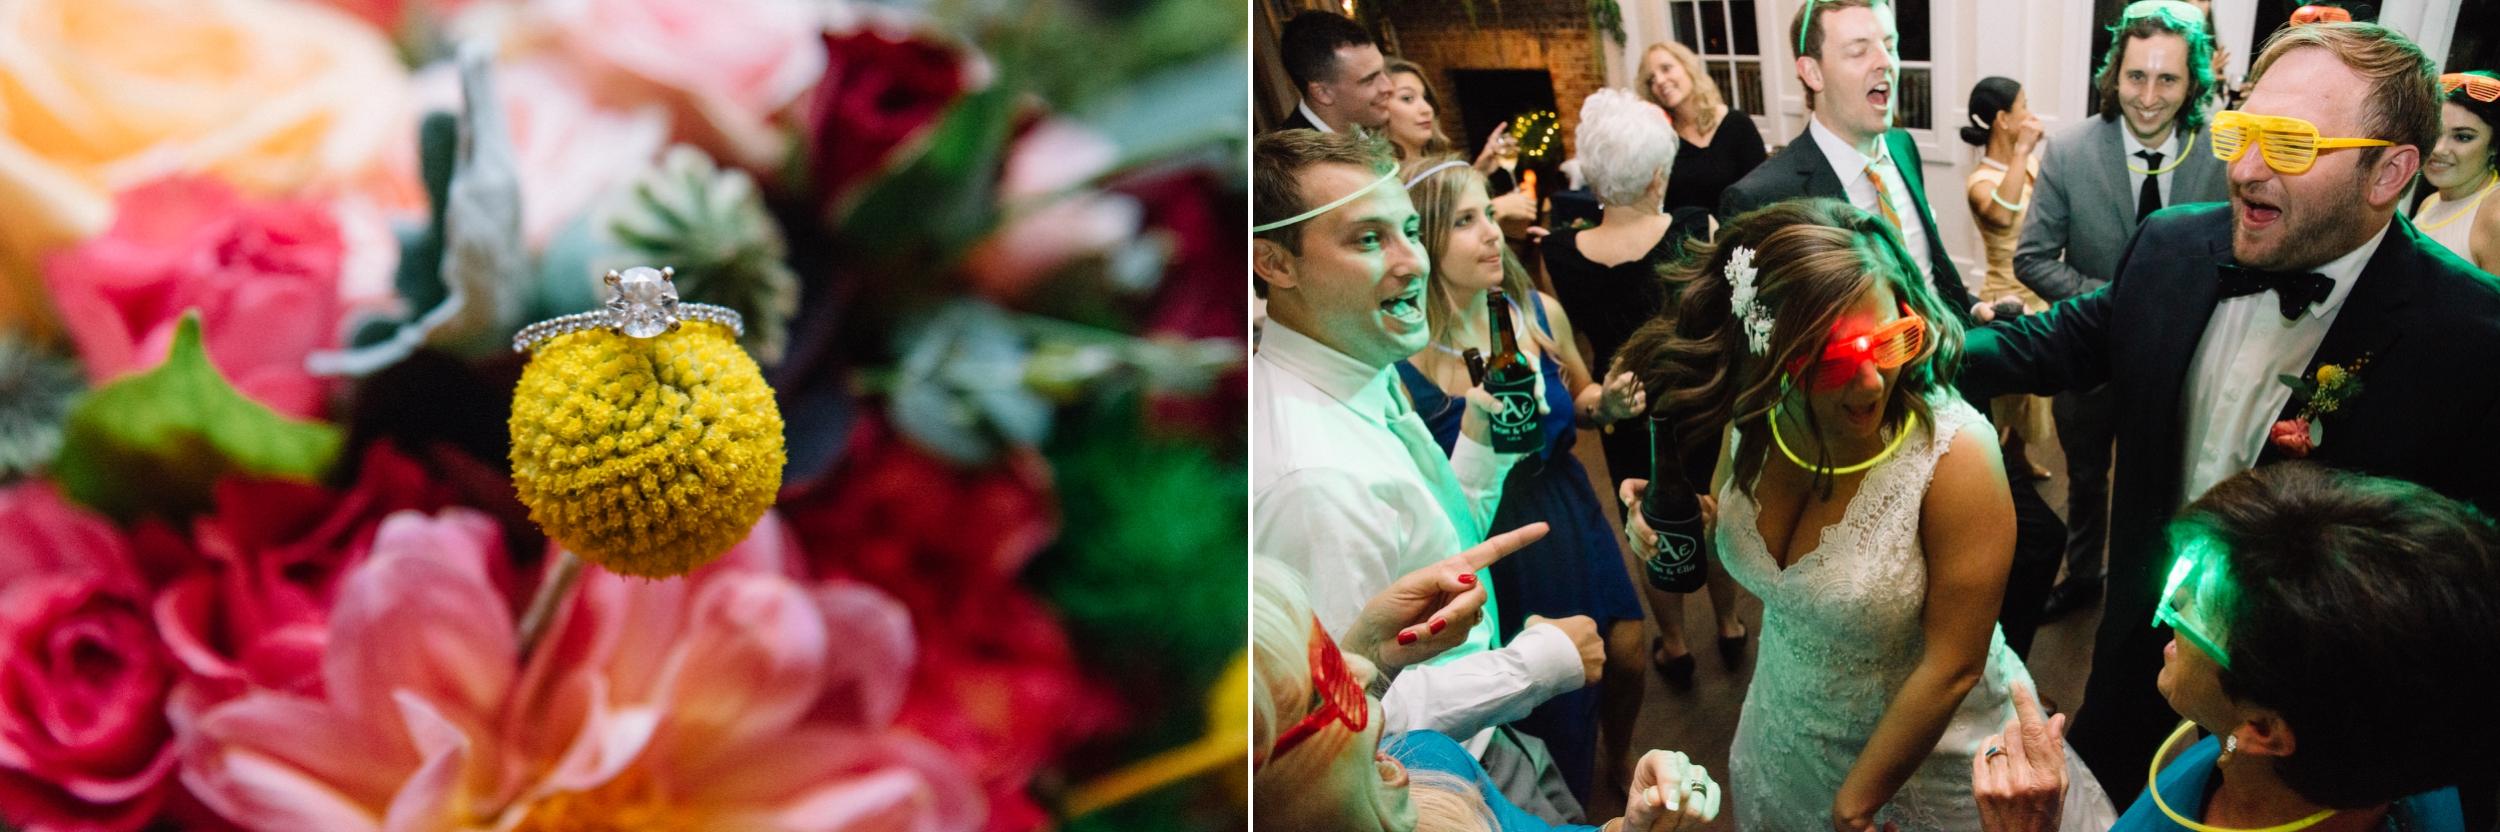 Charleston-wedding-photographer-118.jpg